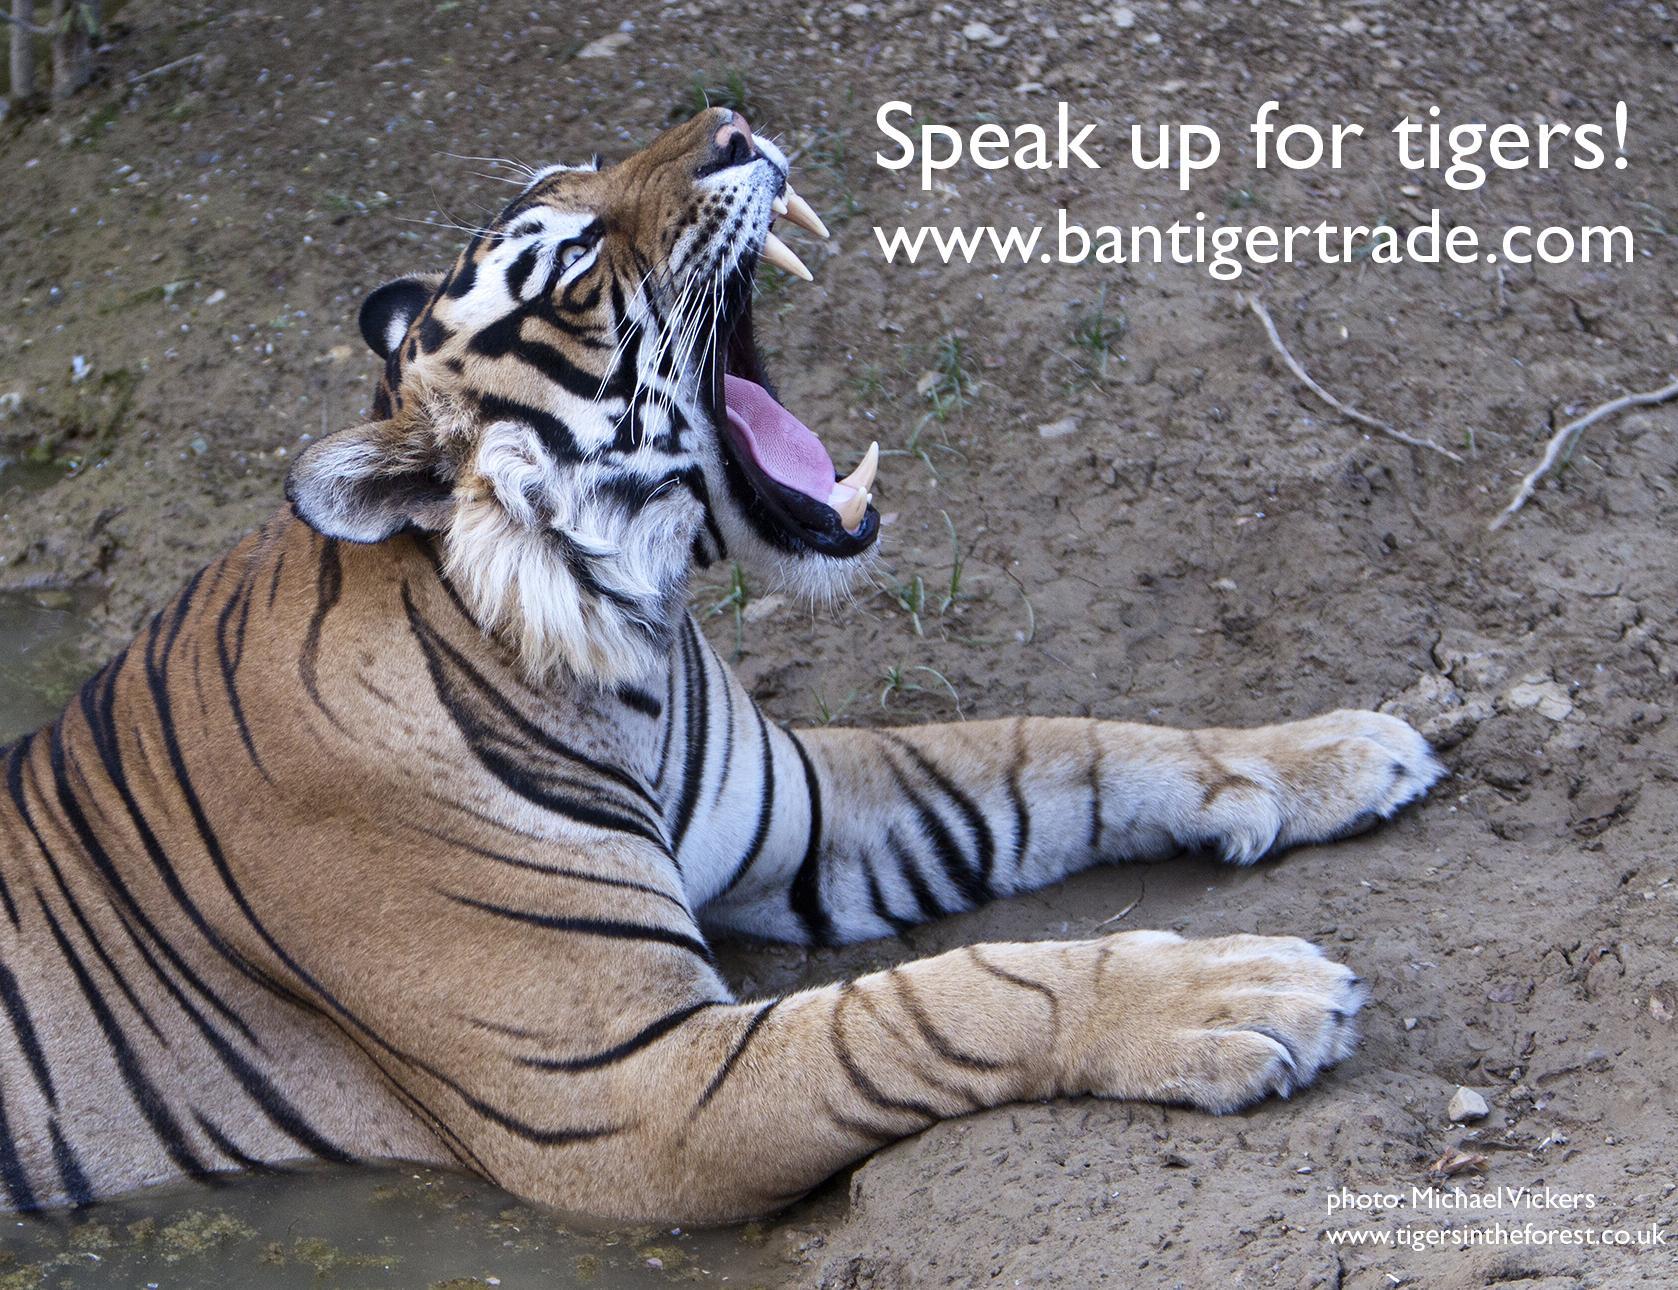 RT @TigerTimeNow: @DeborahMeaden pls RT for tigers on #WorldWildlifeDay & be #SeriousAboutWildlifeCrime with http://t.co/4mCUzRUt5U http://…